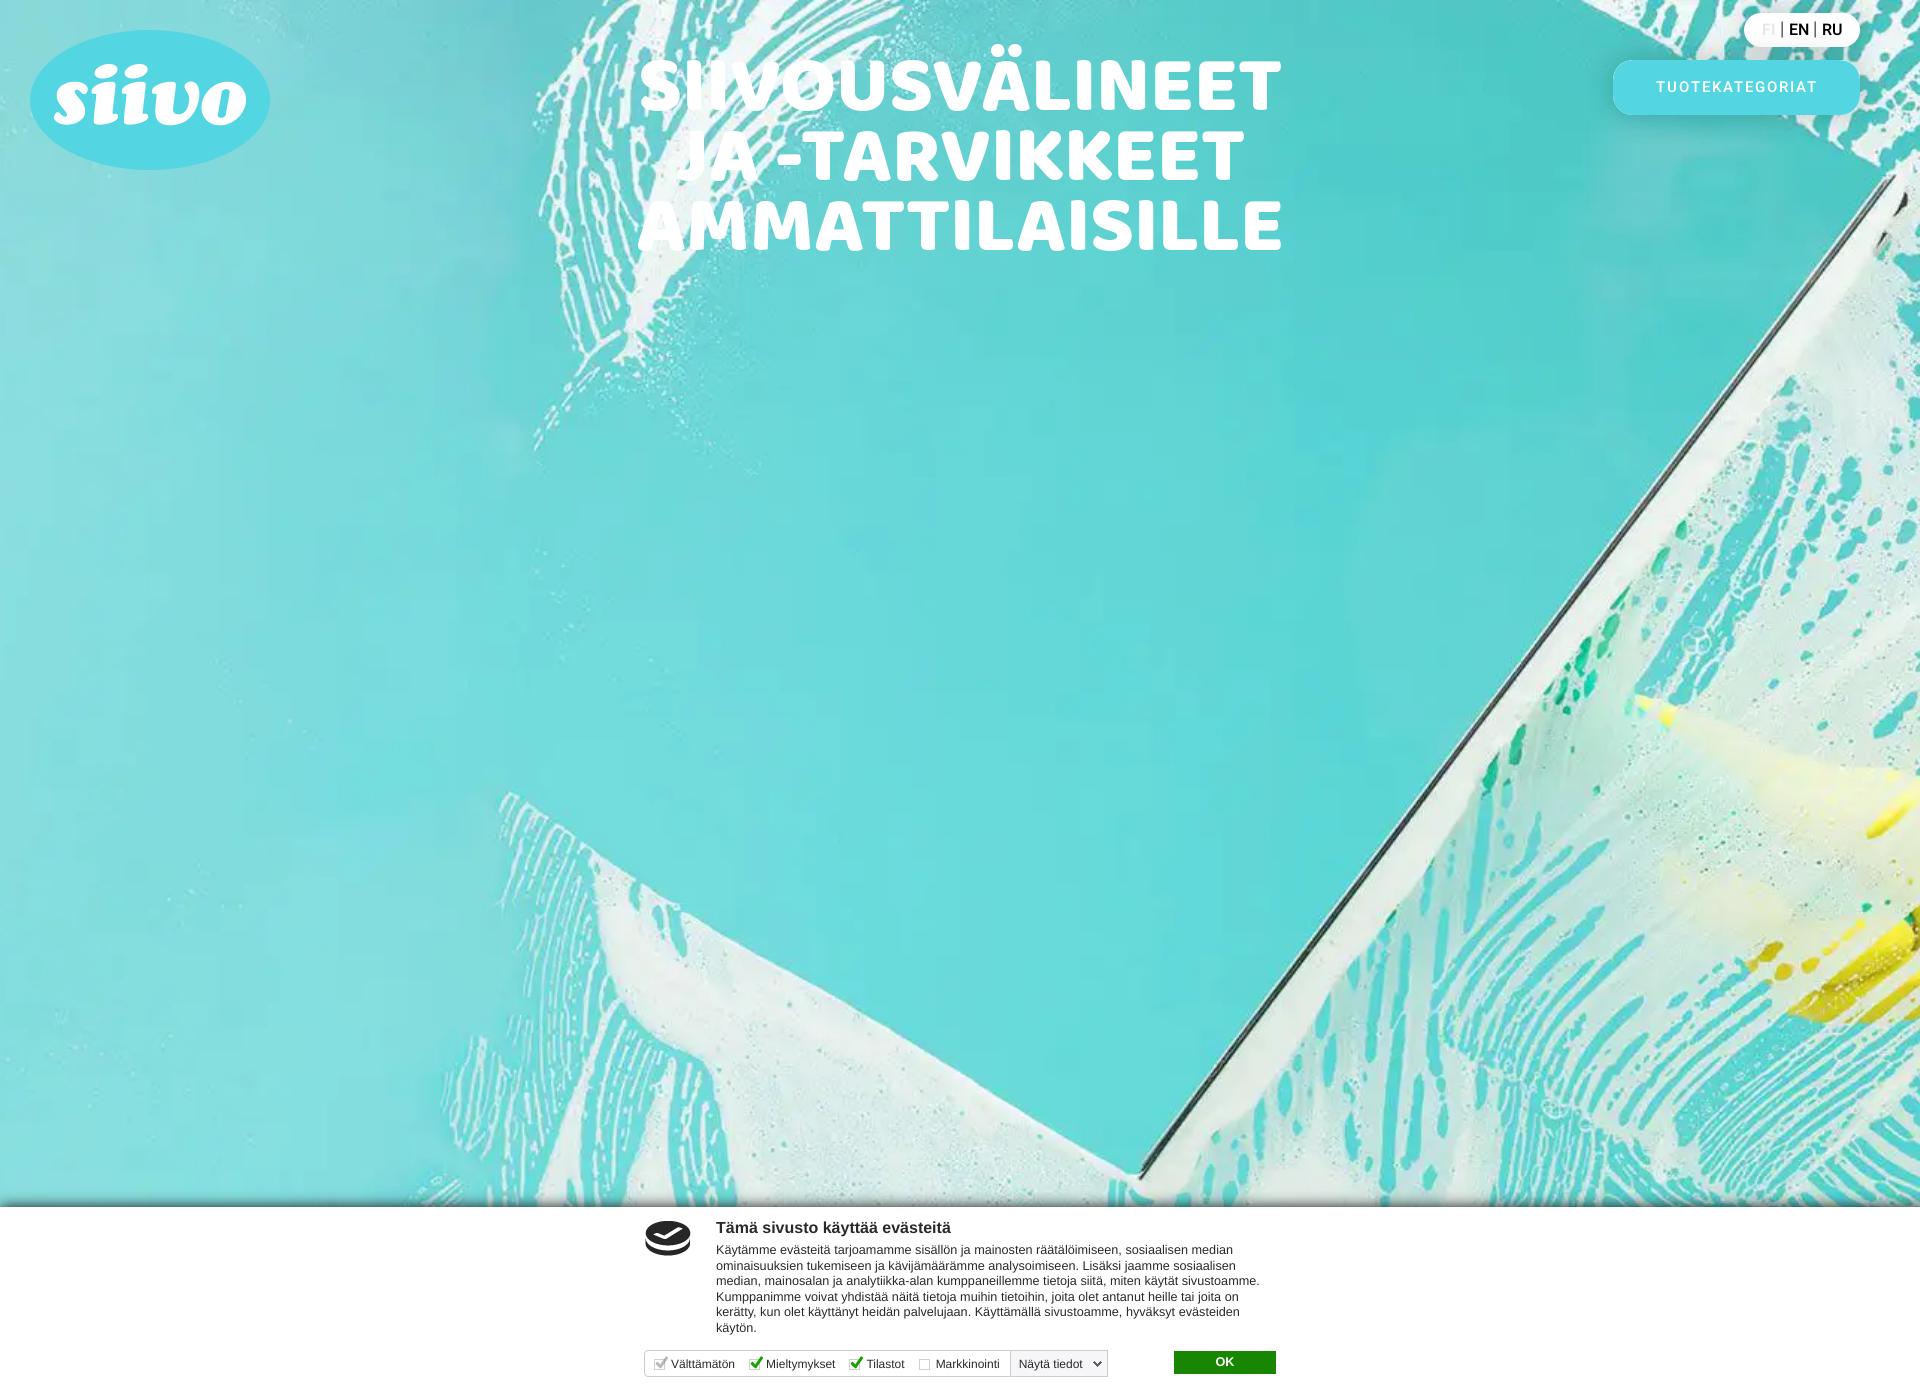 Screenshot for siivotuote.fi